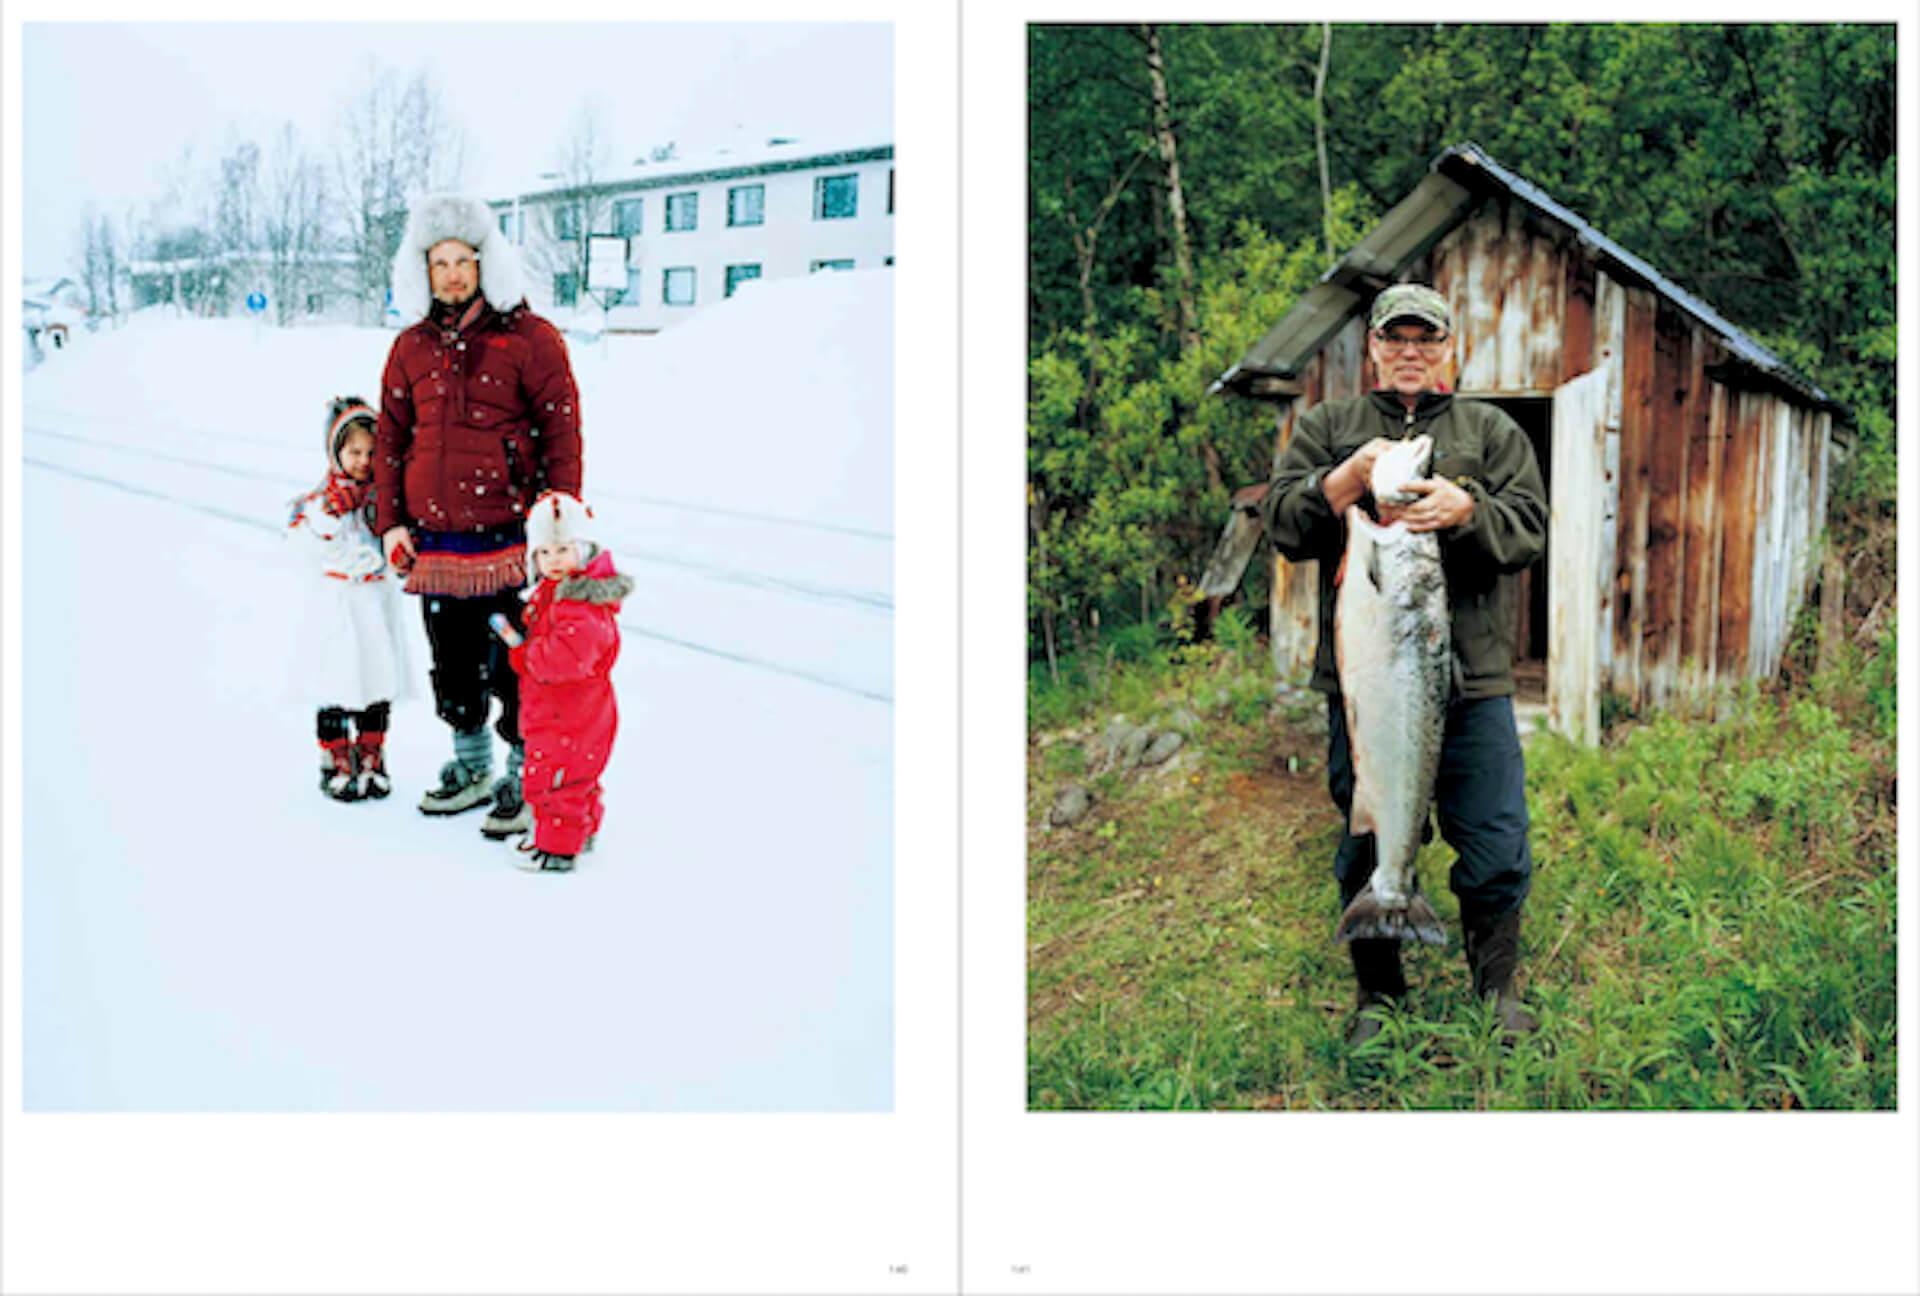 『TRANSIT』の10年超の歩みが2冊の写真集に!企画展<光の記憶- Through our habitat>も開催 art191029_transit_8